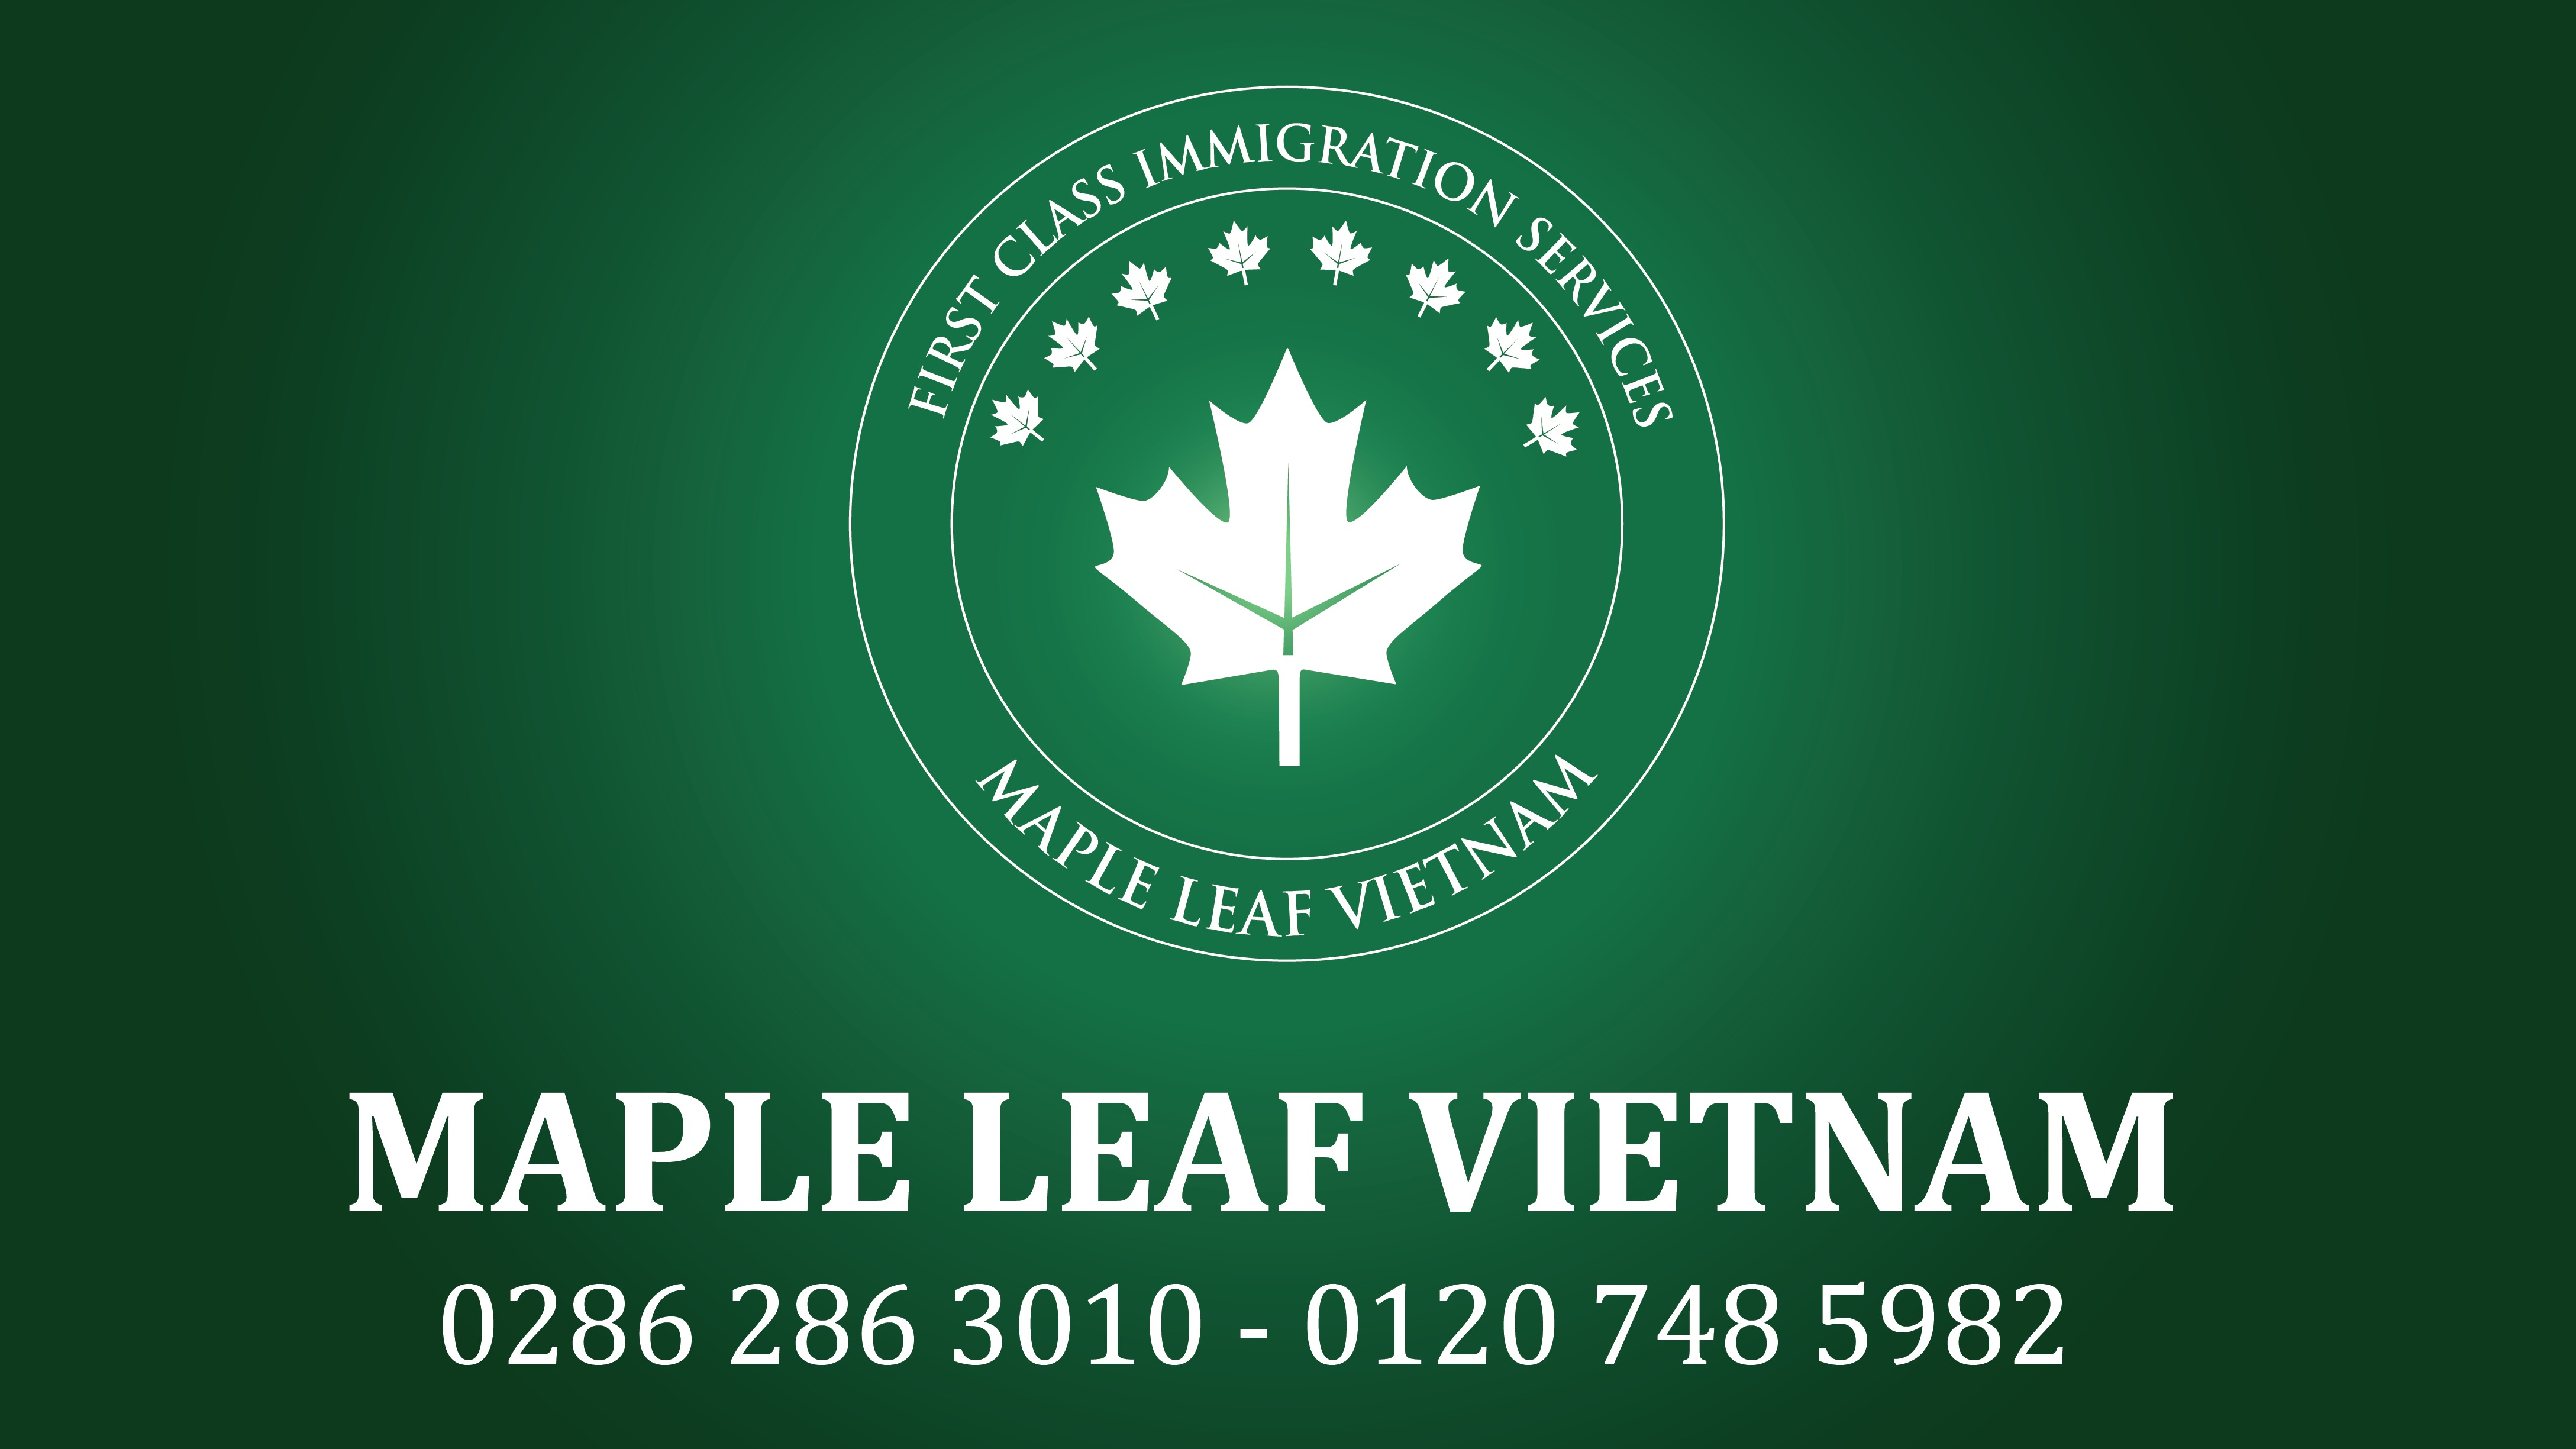 diem-lai-hanh-trinh-6-thang-dau-nam-cung-maple-leaf-vietnam